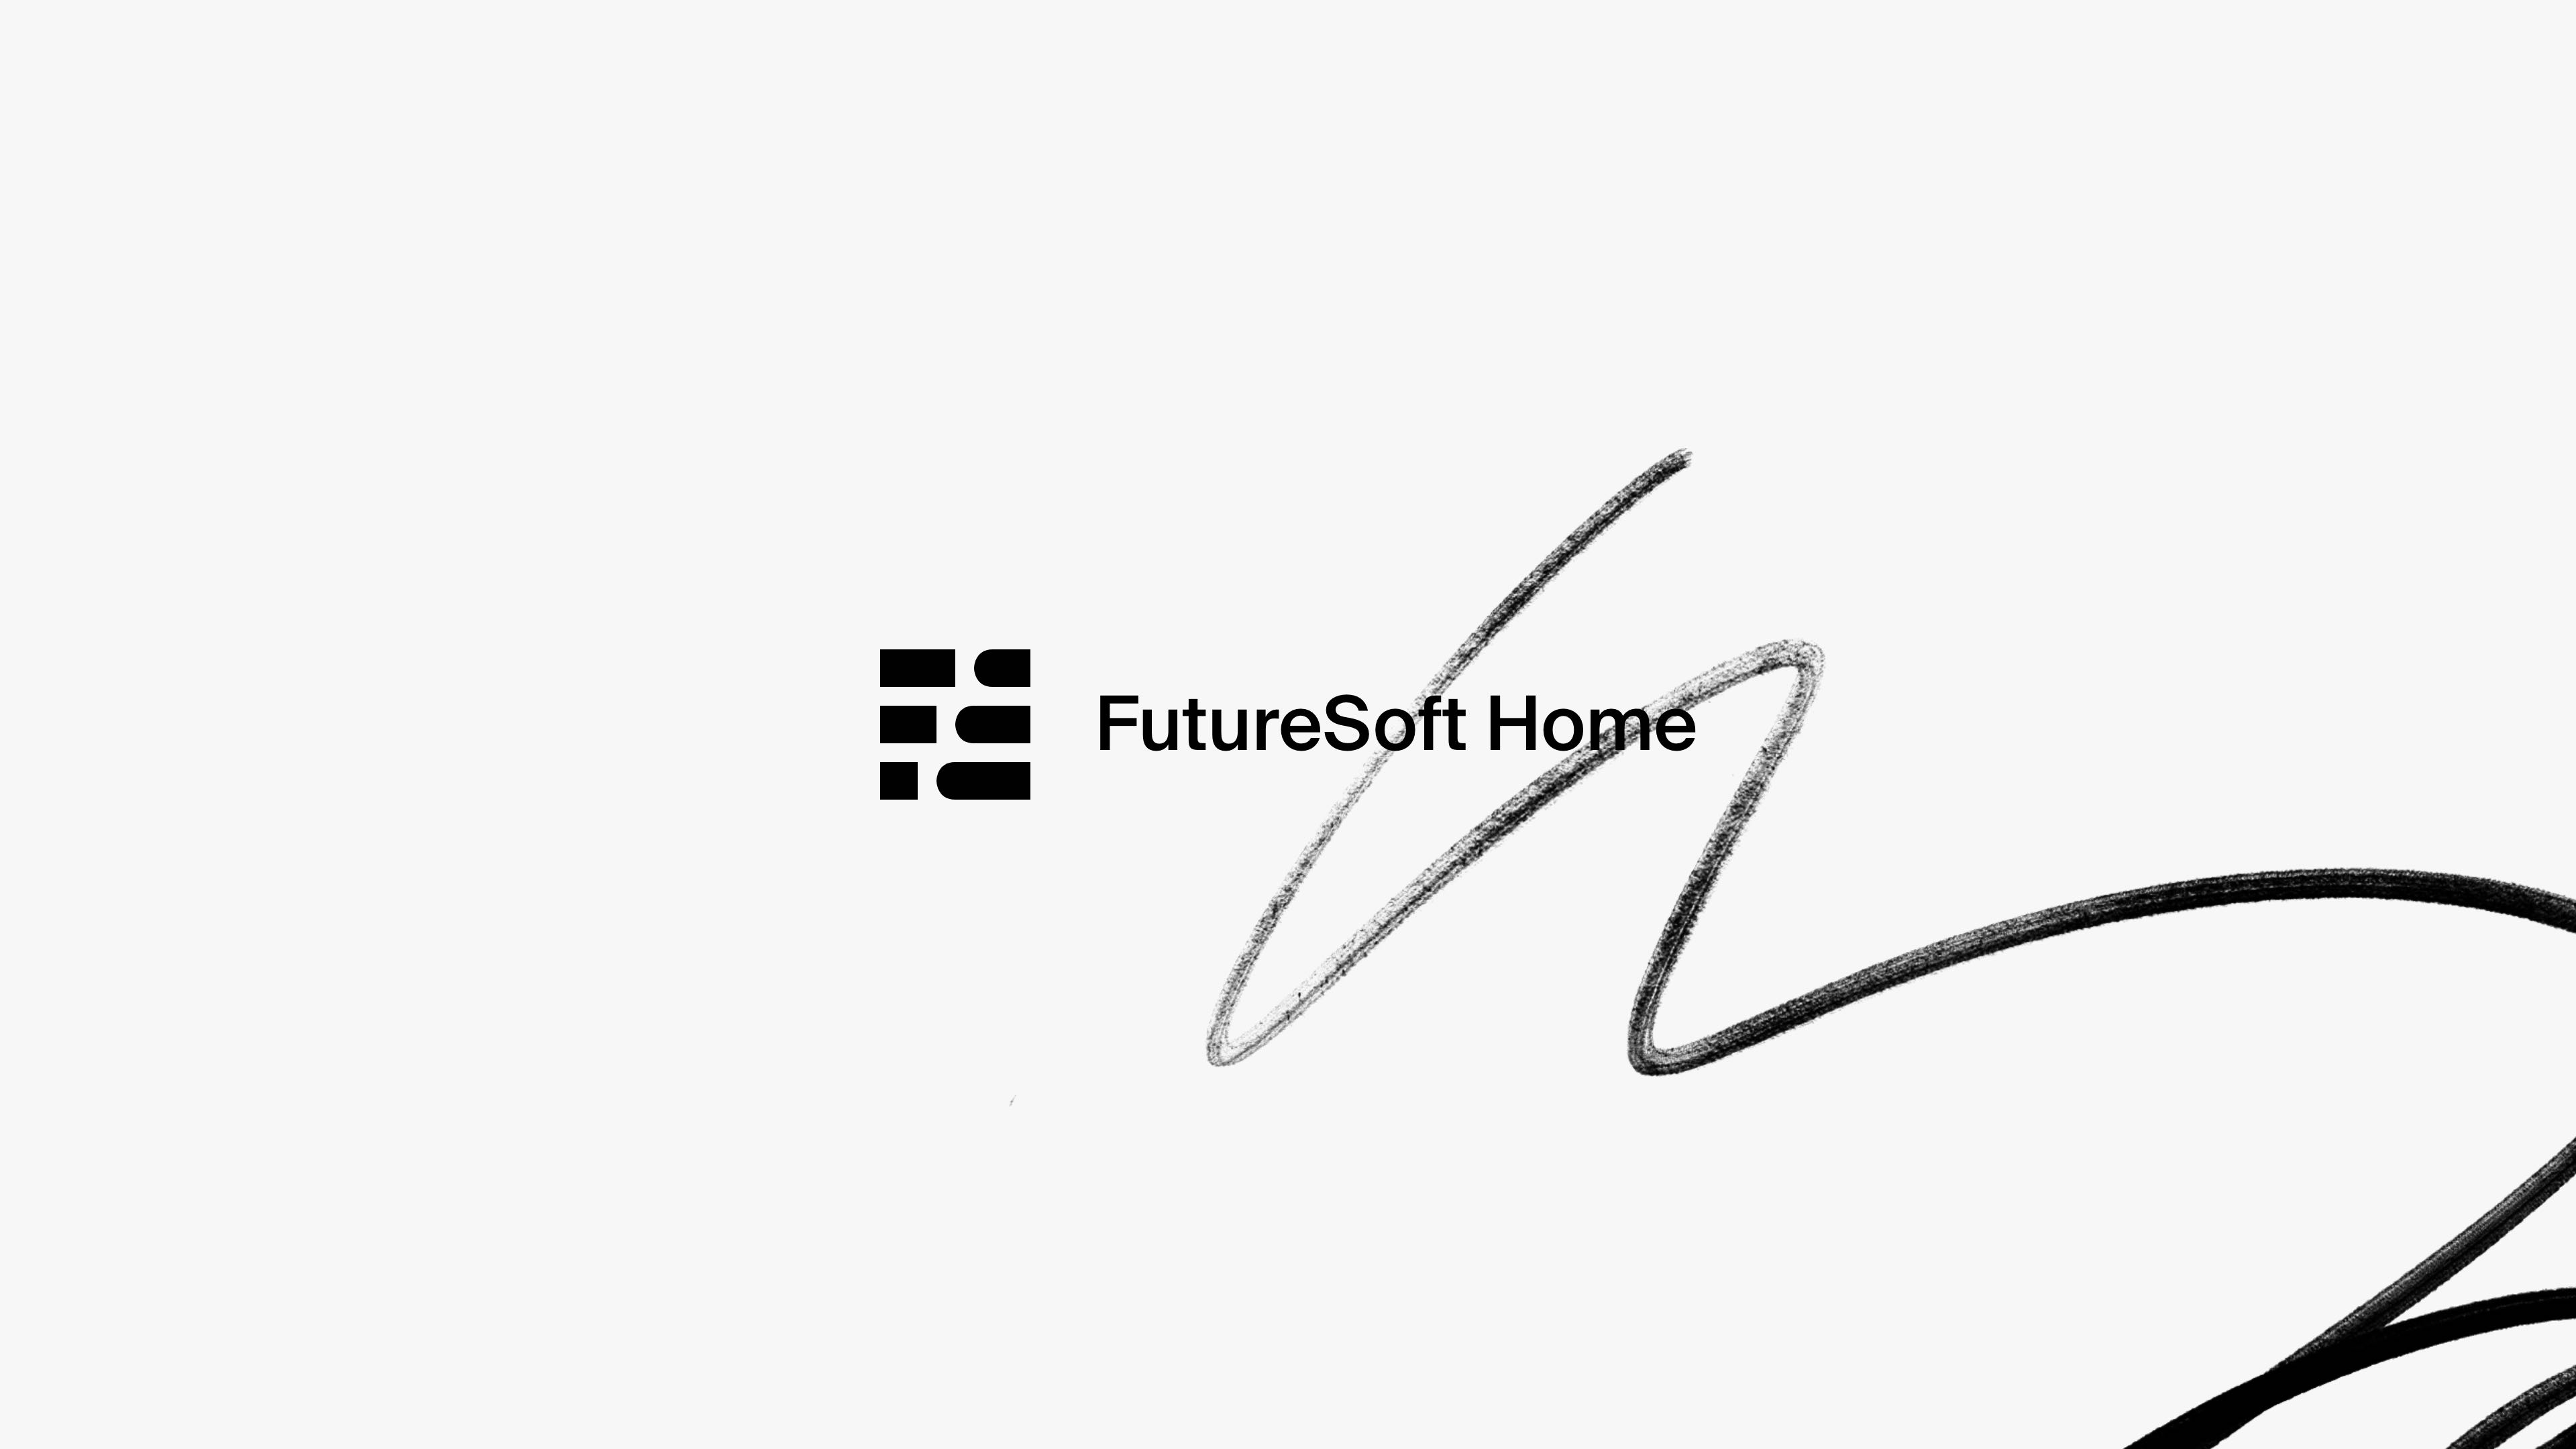 FutureSoft Home